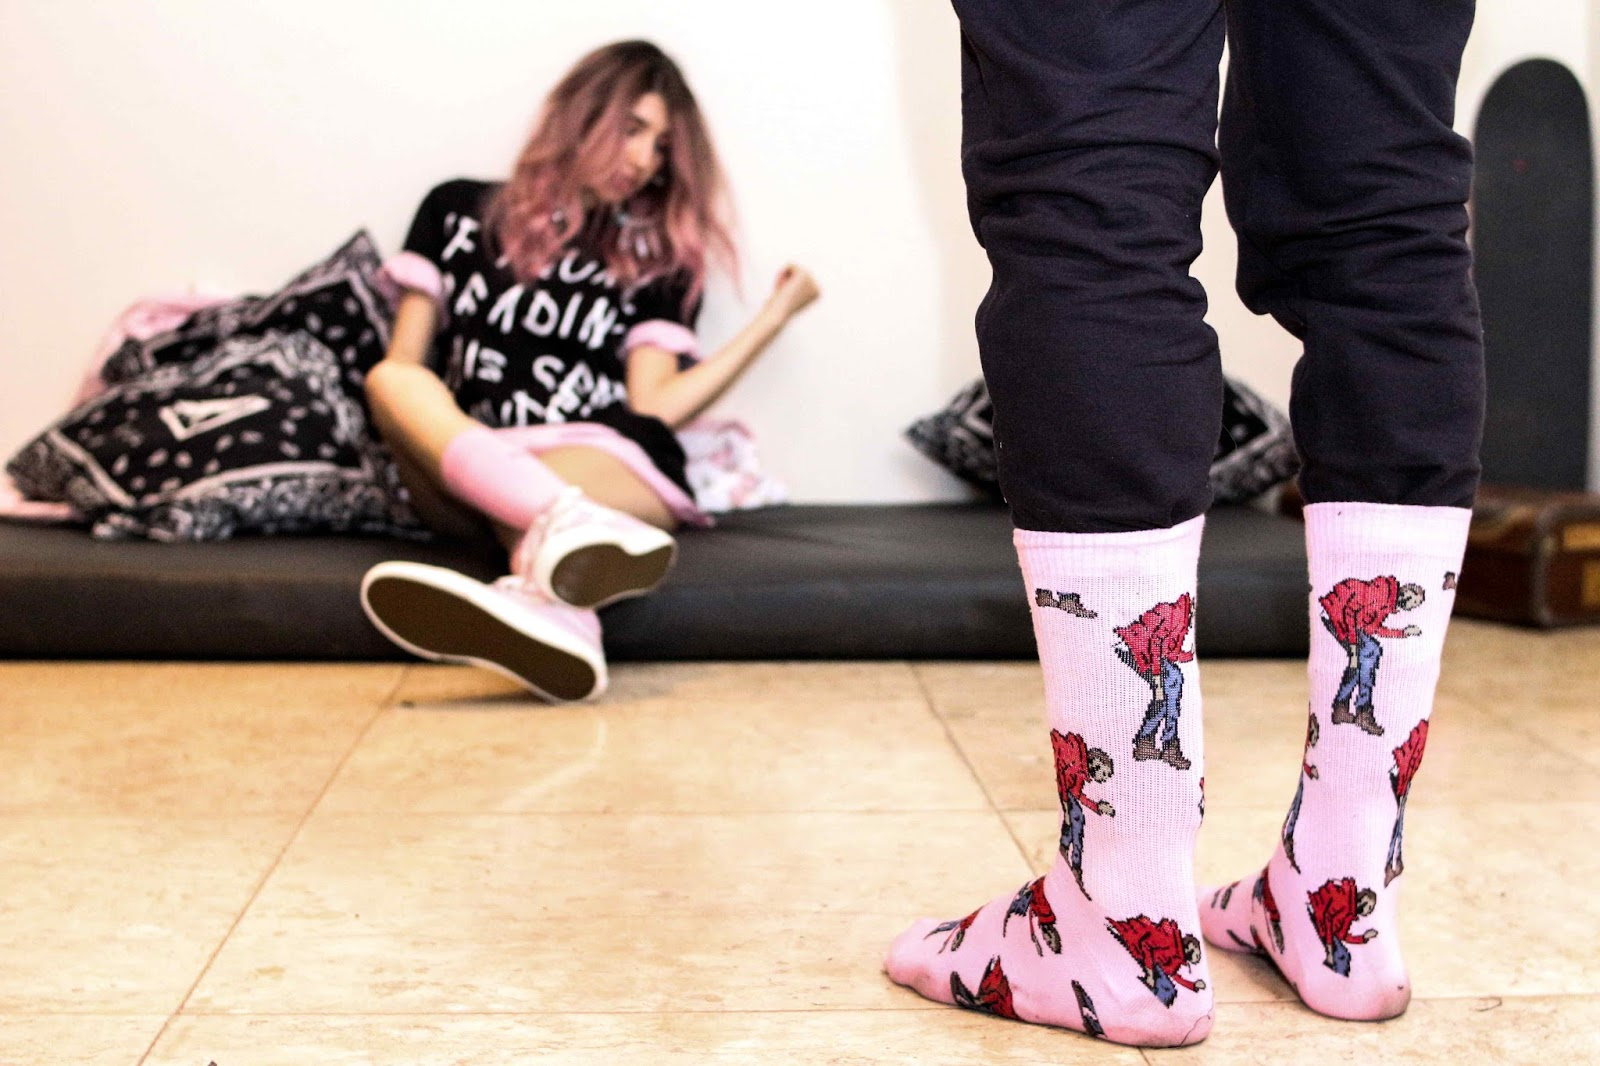 feed the feet nephew parceria 02 - Nephew e Feed The Feet mergulham no universo pop americano